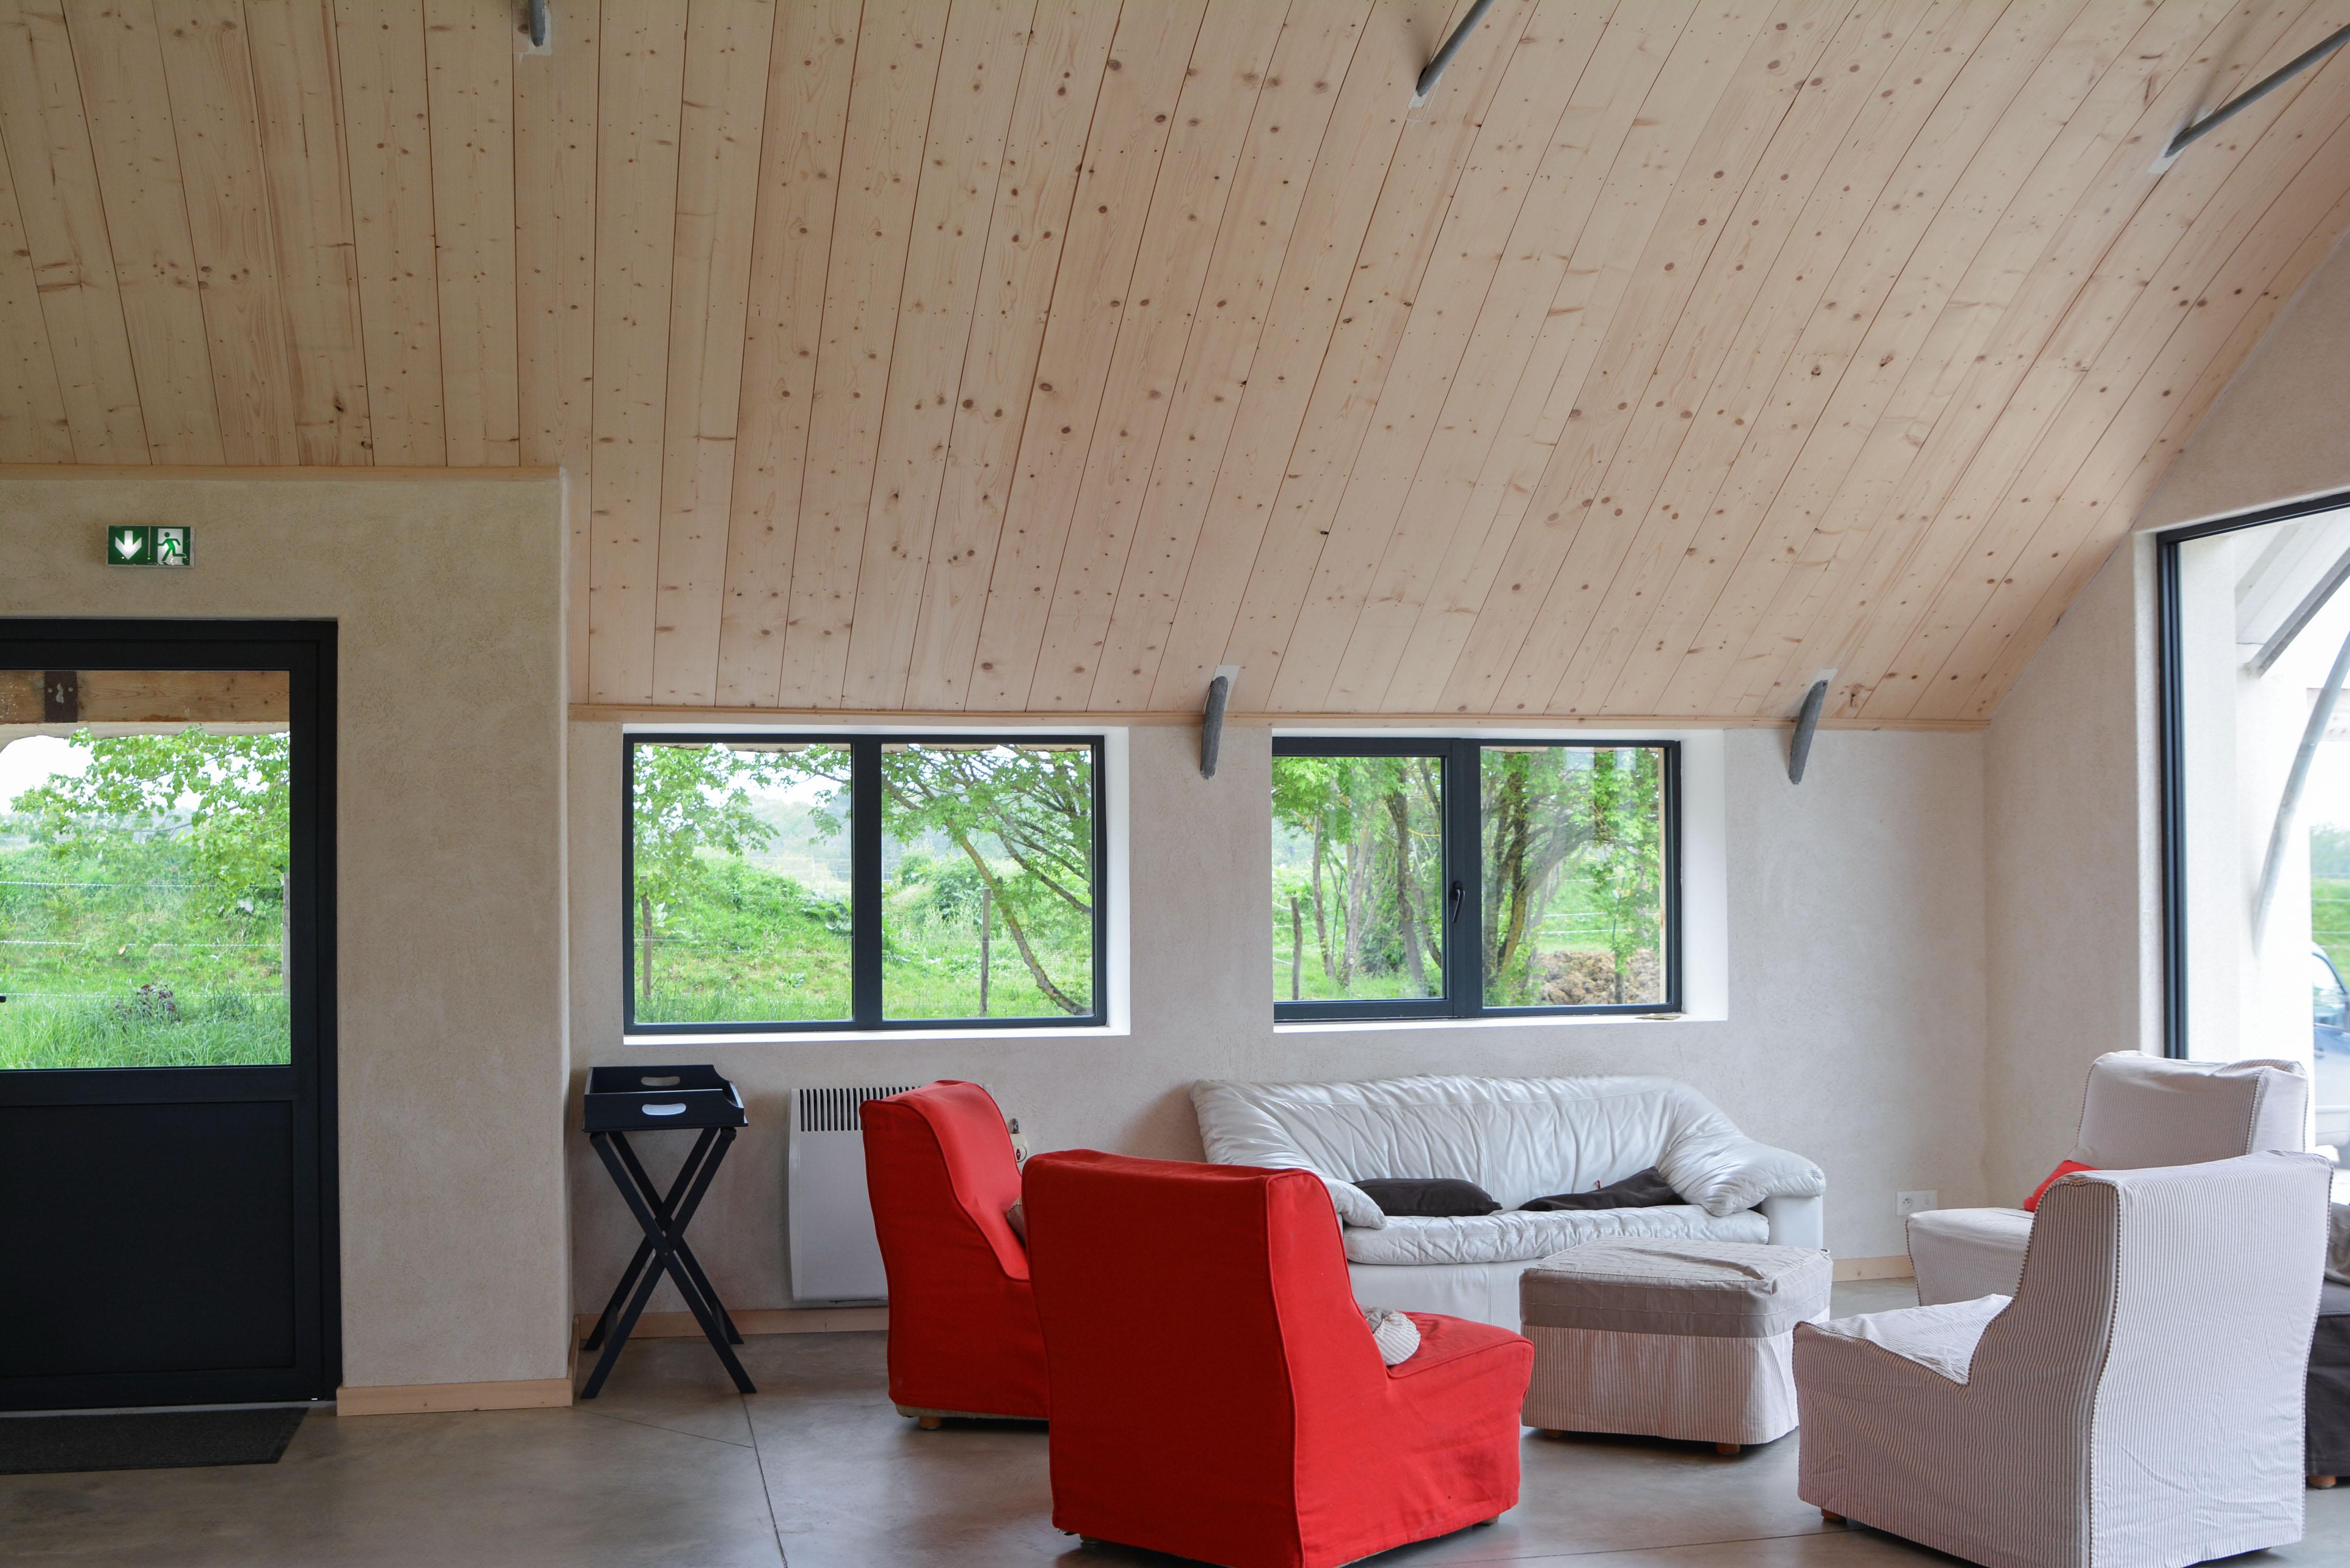 salle commune gite Cheval et nature